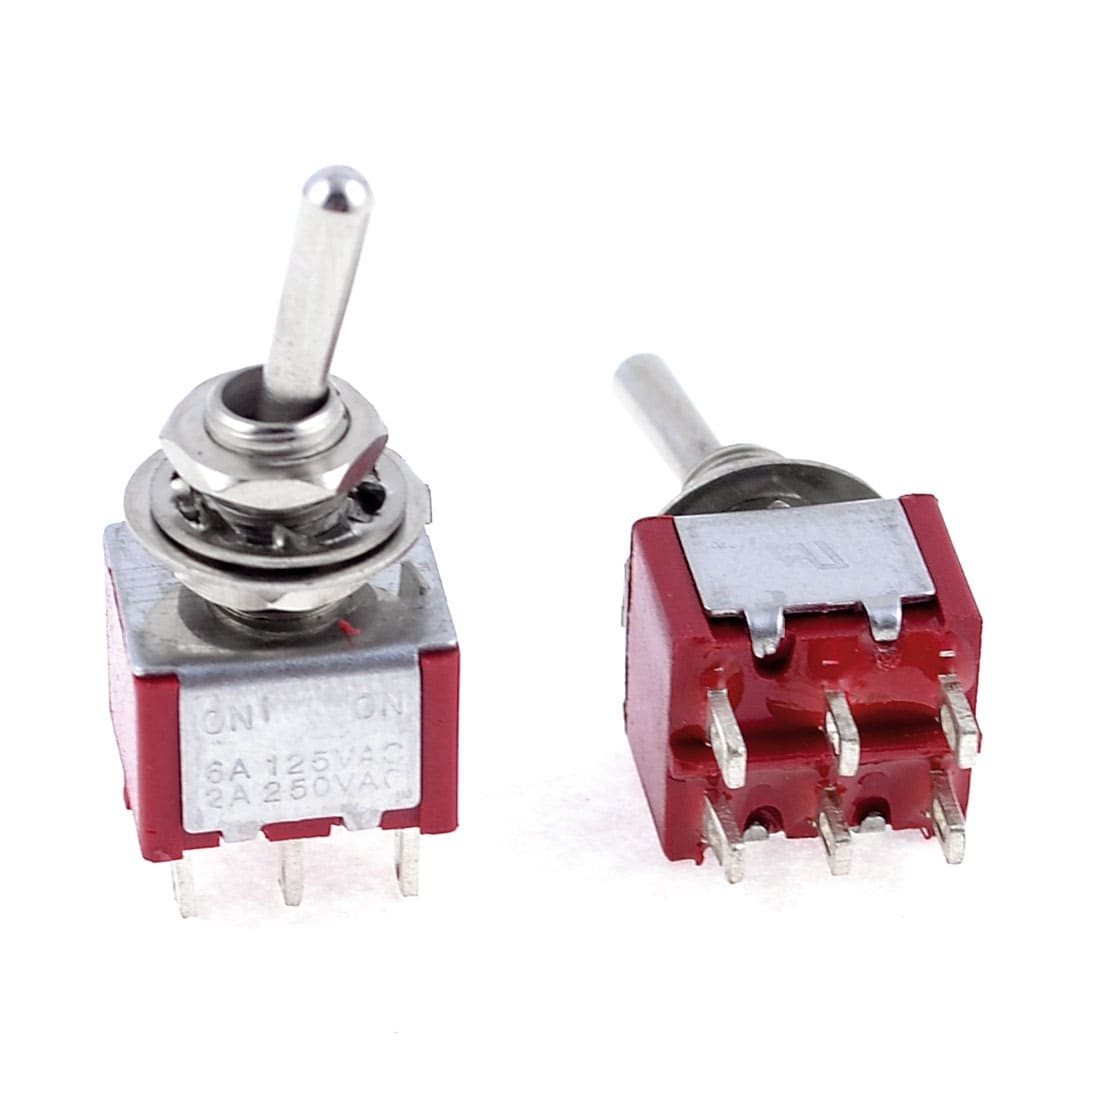 10 x Mini Miniature On-On Slide Switch 6-Pin DPDT